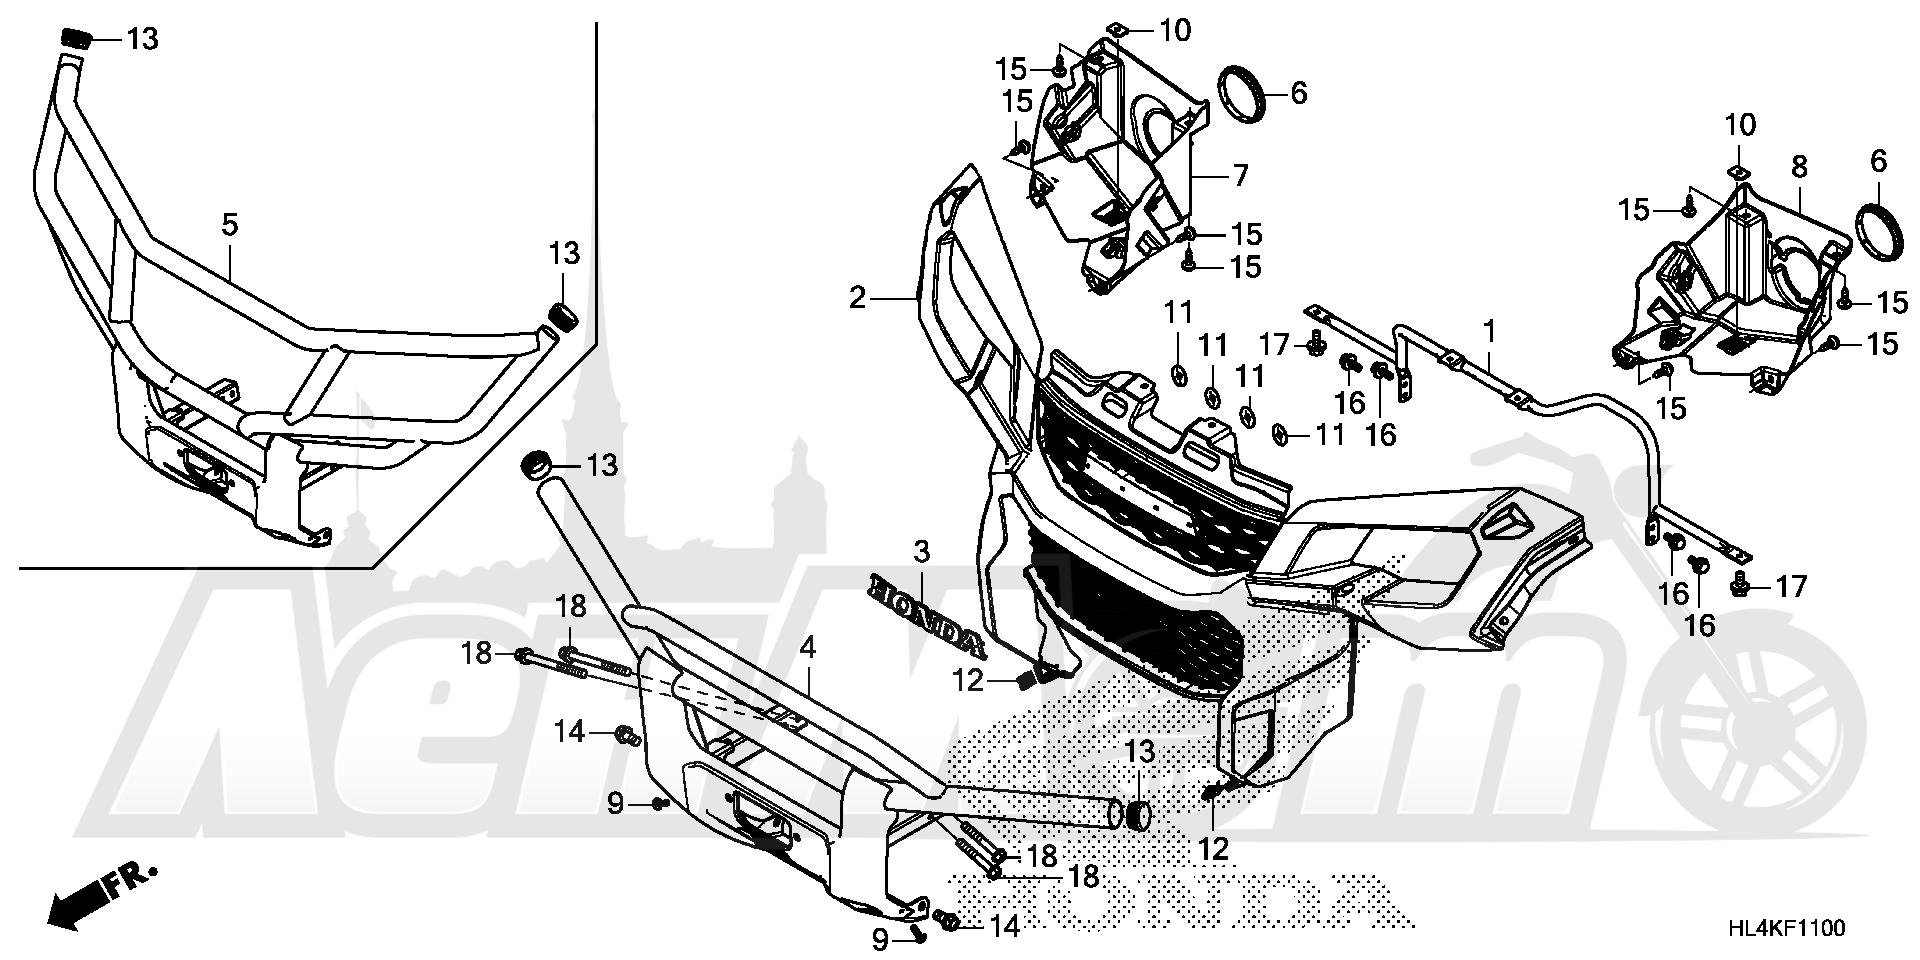 Запчасти для Квадроцикла Honda 2019 SXS1000M5L Раздел: FRONT GRILLE AND FRONT BUMPER | перед GRILLE и перед бампер